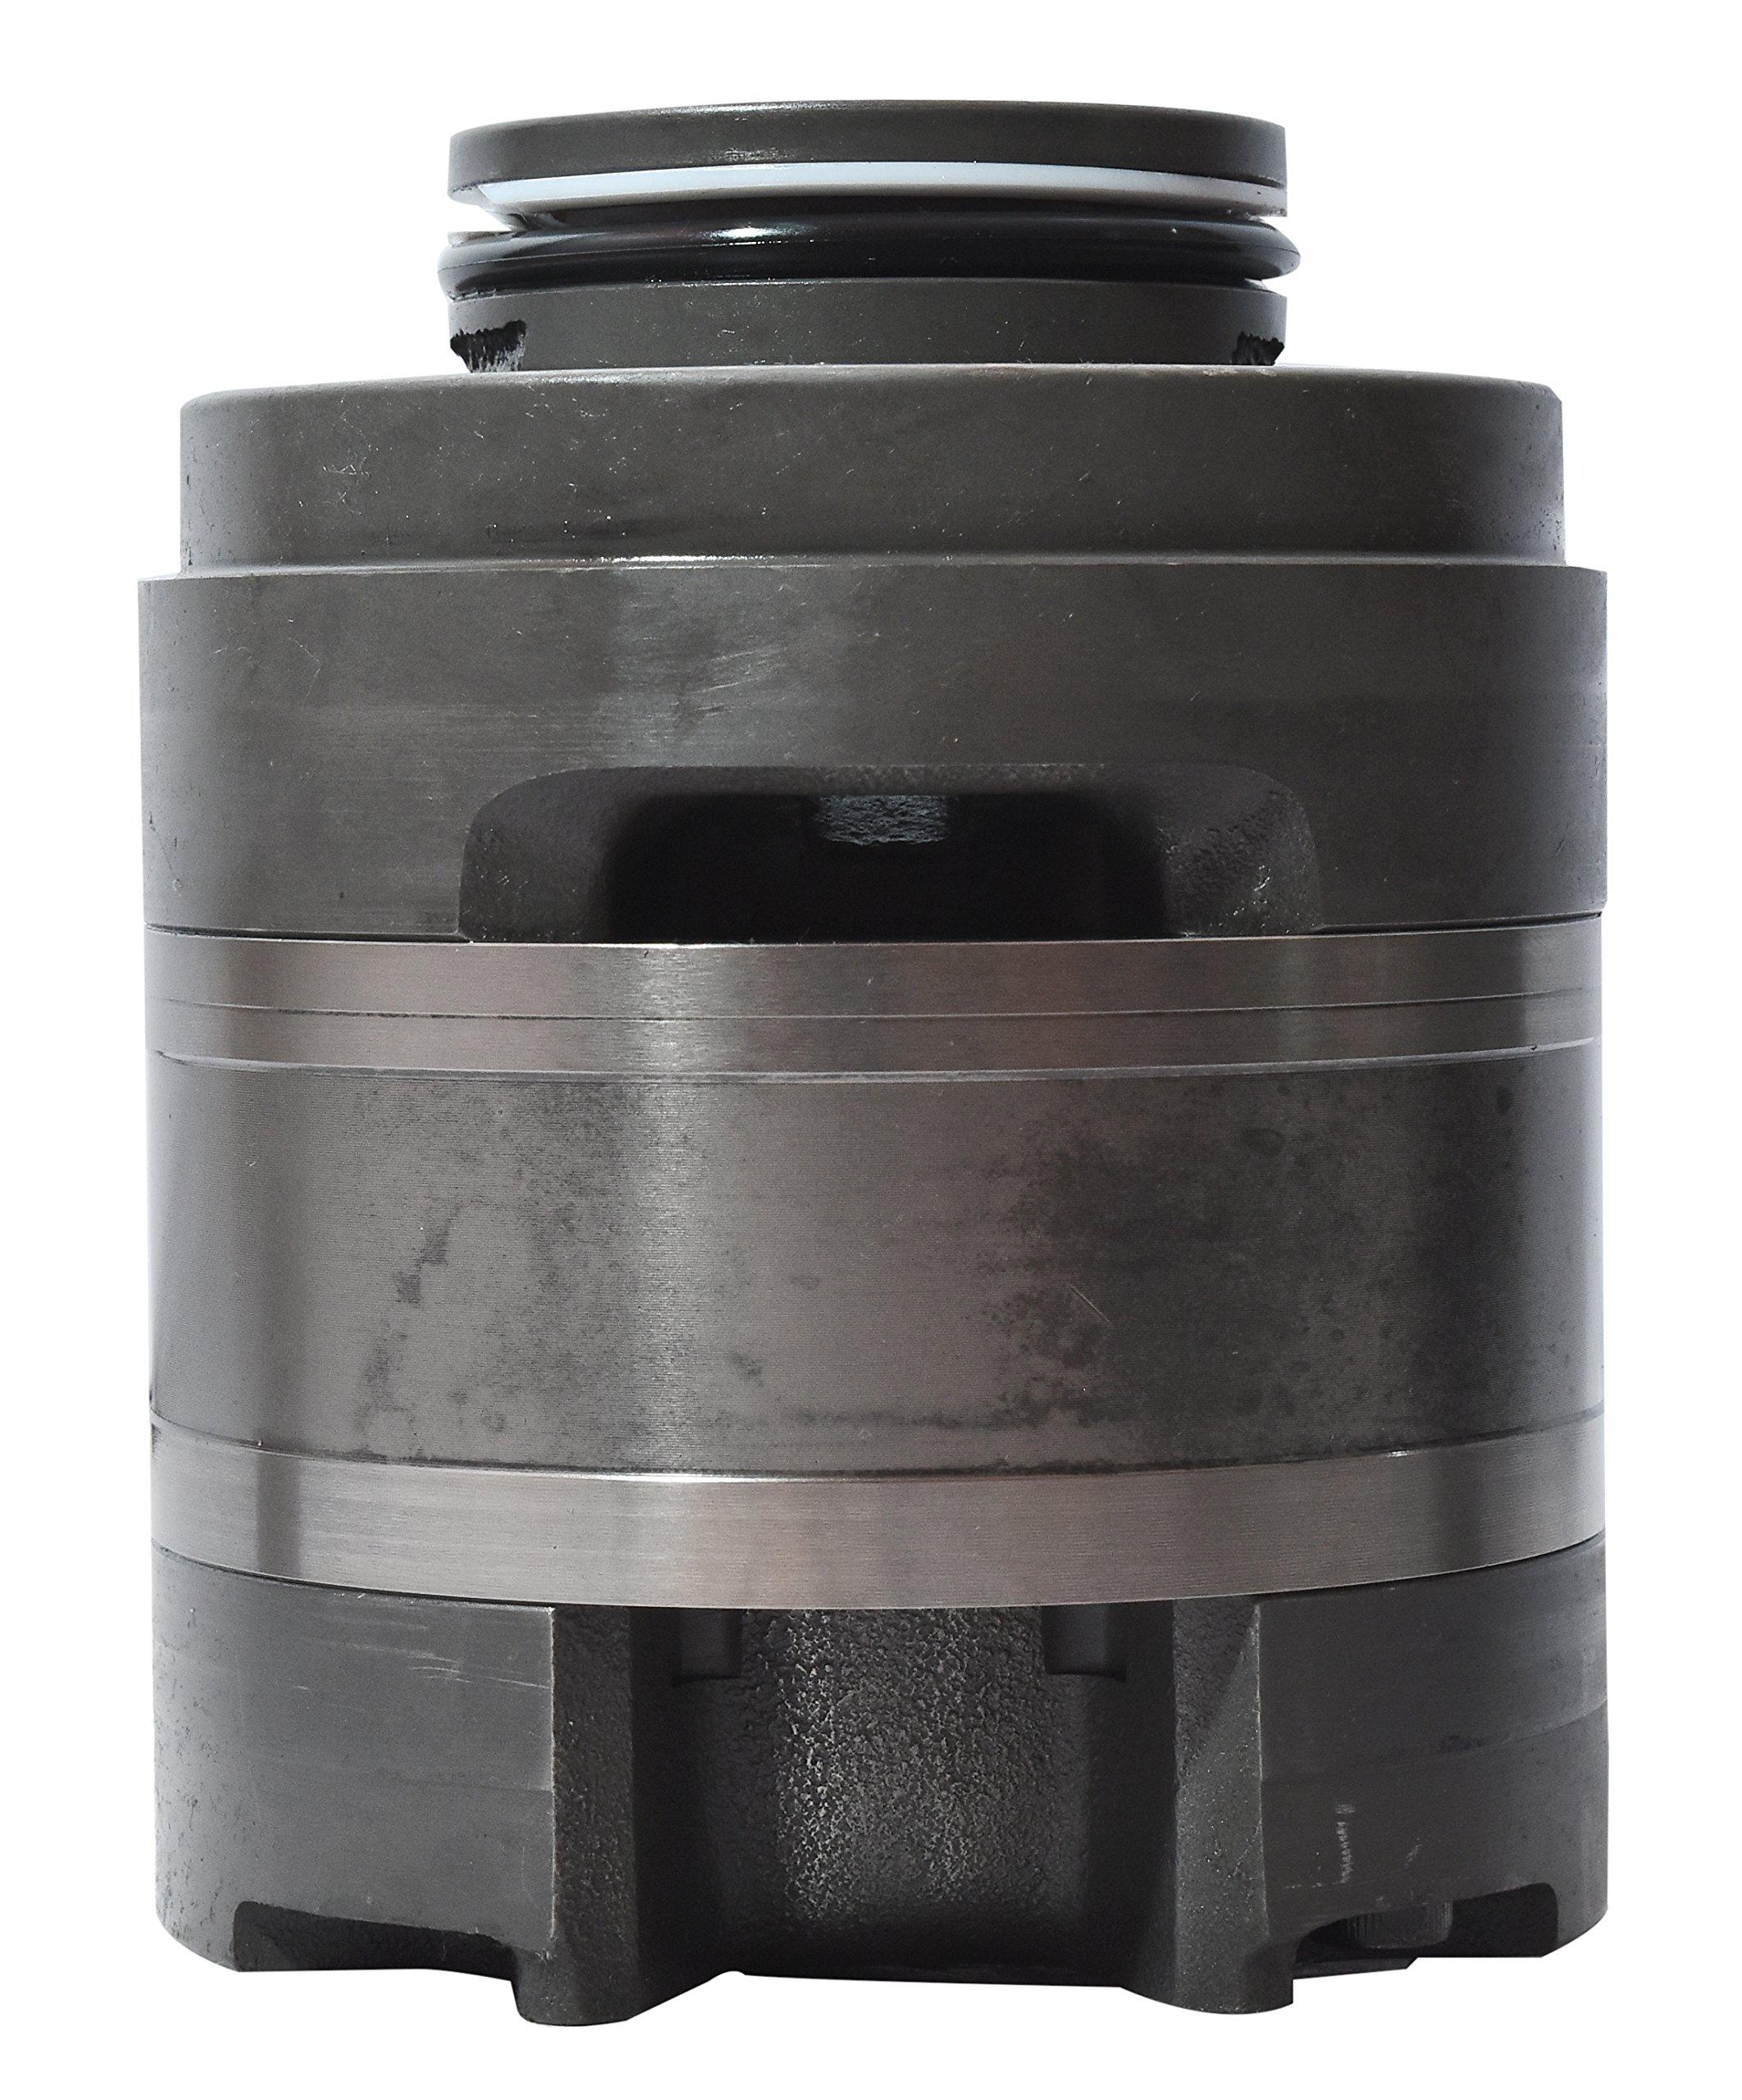 Yuken Hydraulic Vane Pump Spares Catridige Kit CPV2R2-41-R40